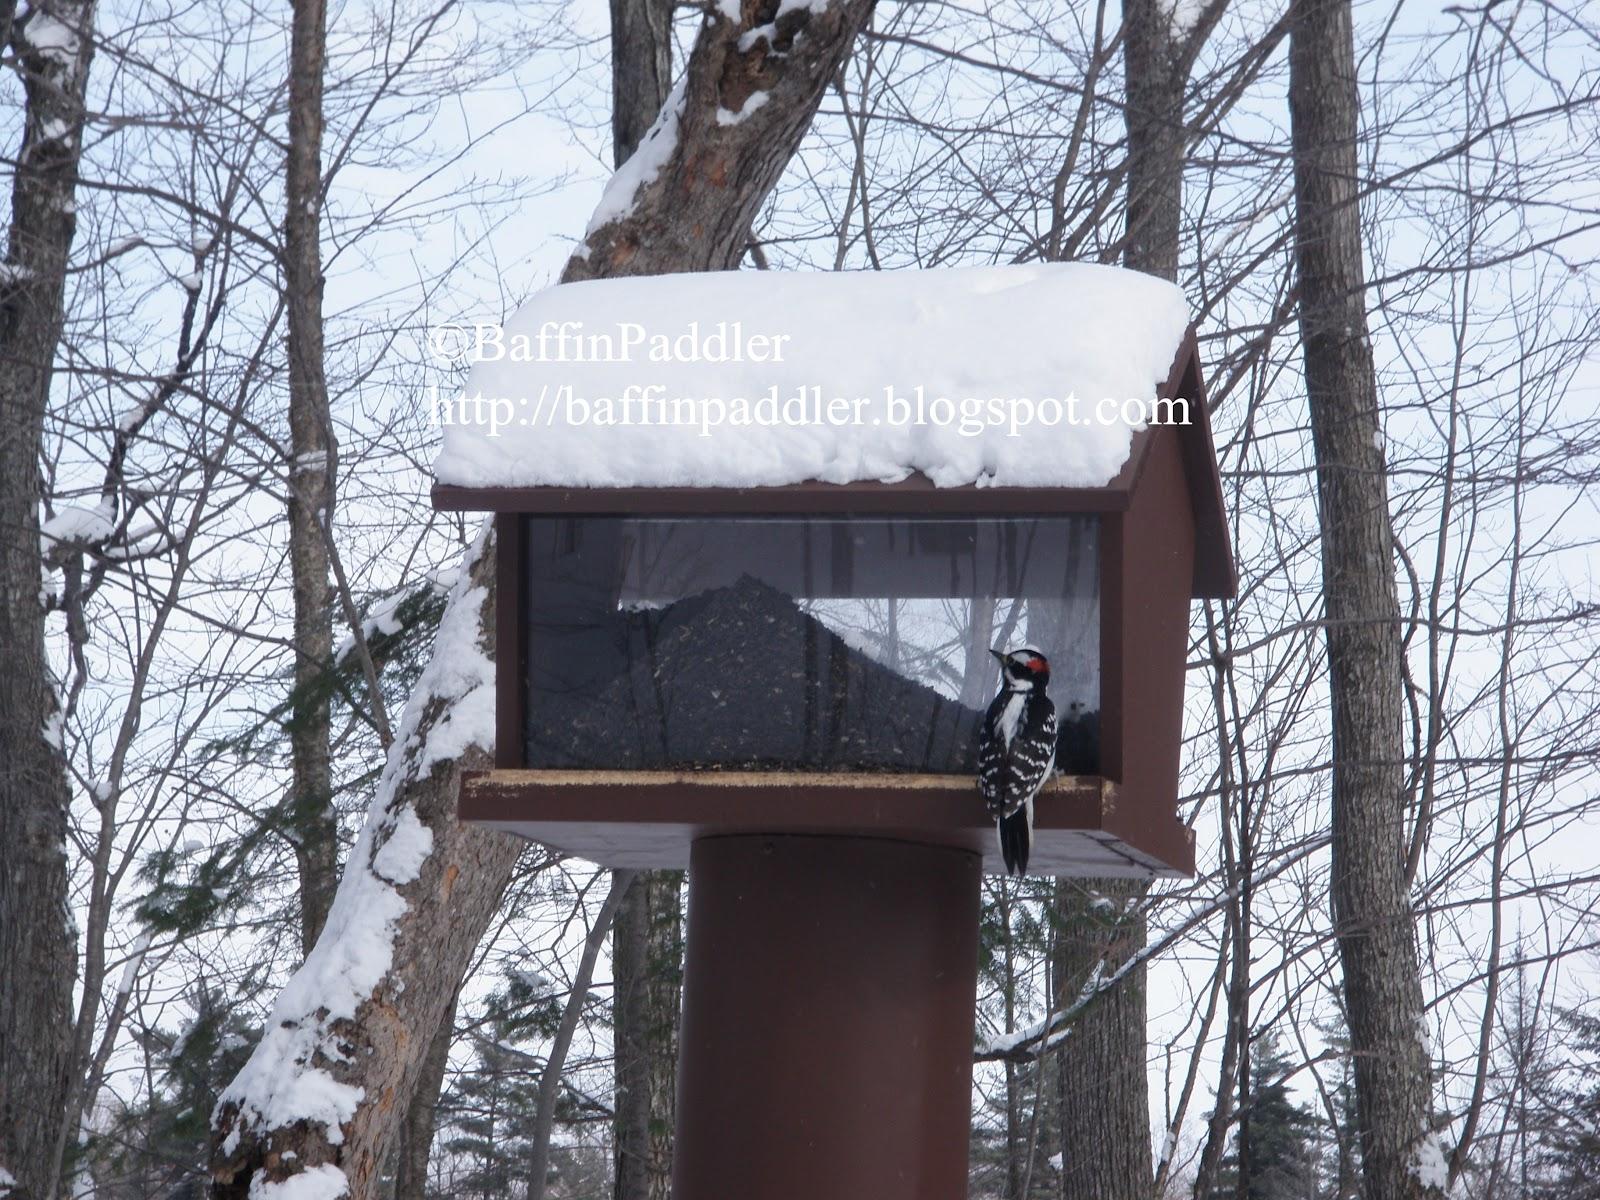 http://1.bp.blogspot.com/-ArstkXhN3Zs/T0mAwX4ljdI/AAAAAAAAA7A/dRqMuwq5SE8/s1600/BaffinPaddler_woodpecker-shilly-shally-cabin-gatineau-park-cross-country-skiing-quebec-canada.JPG